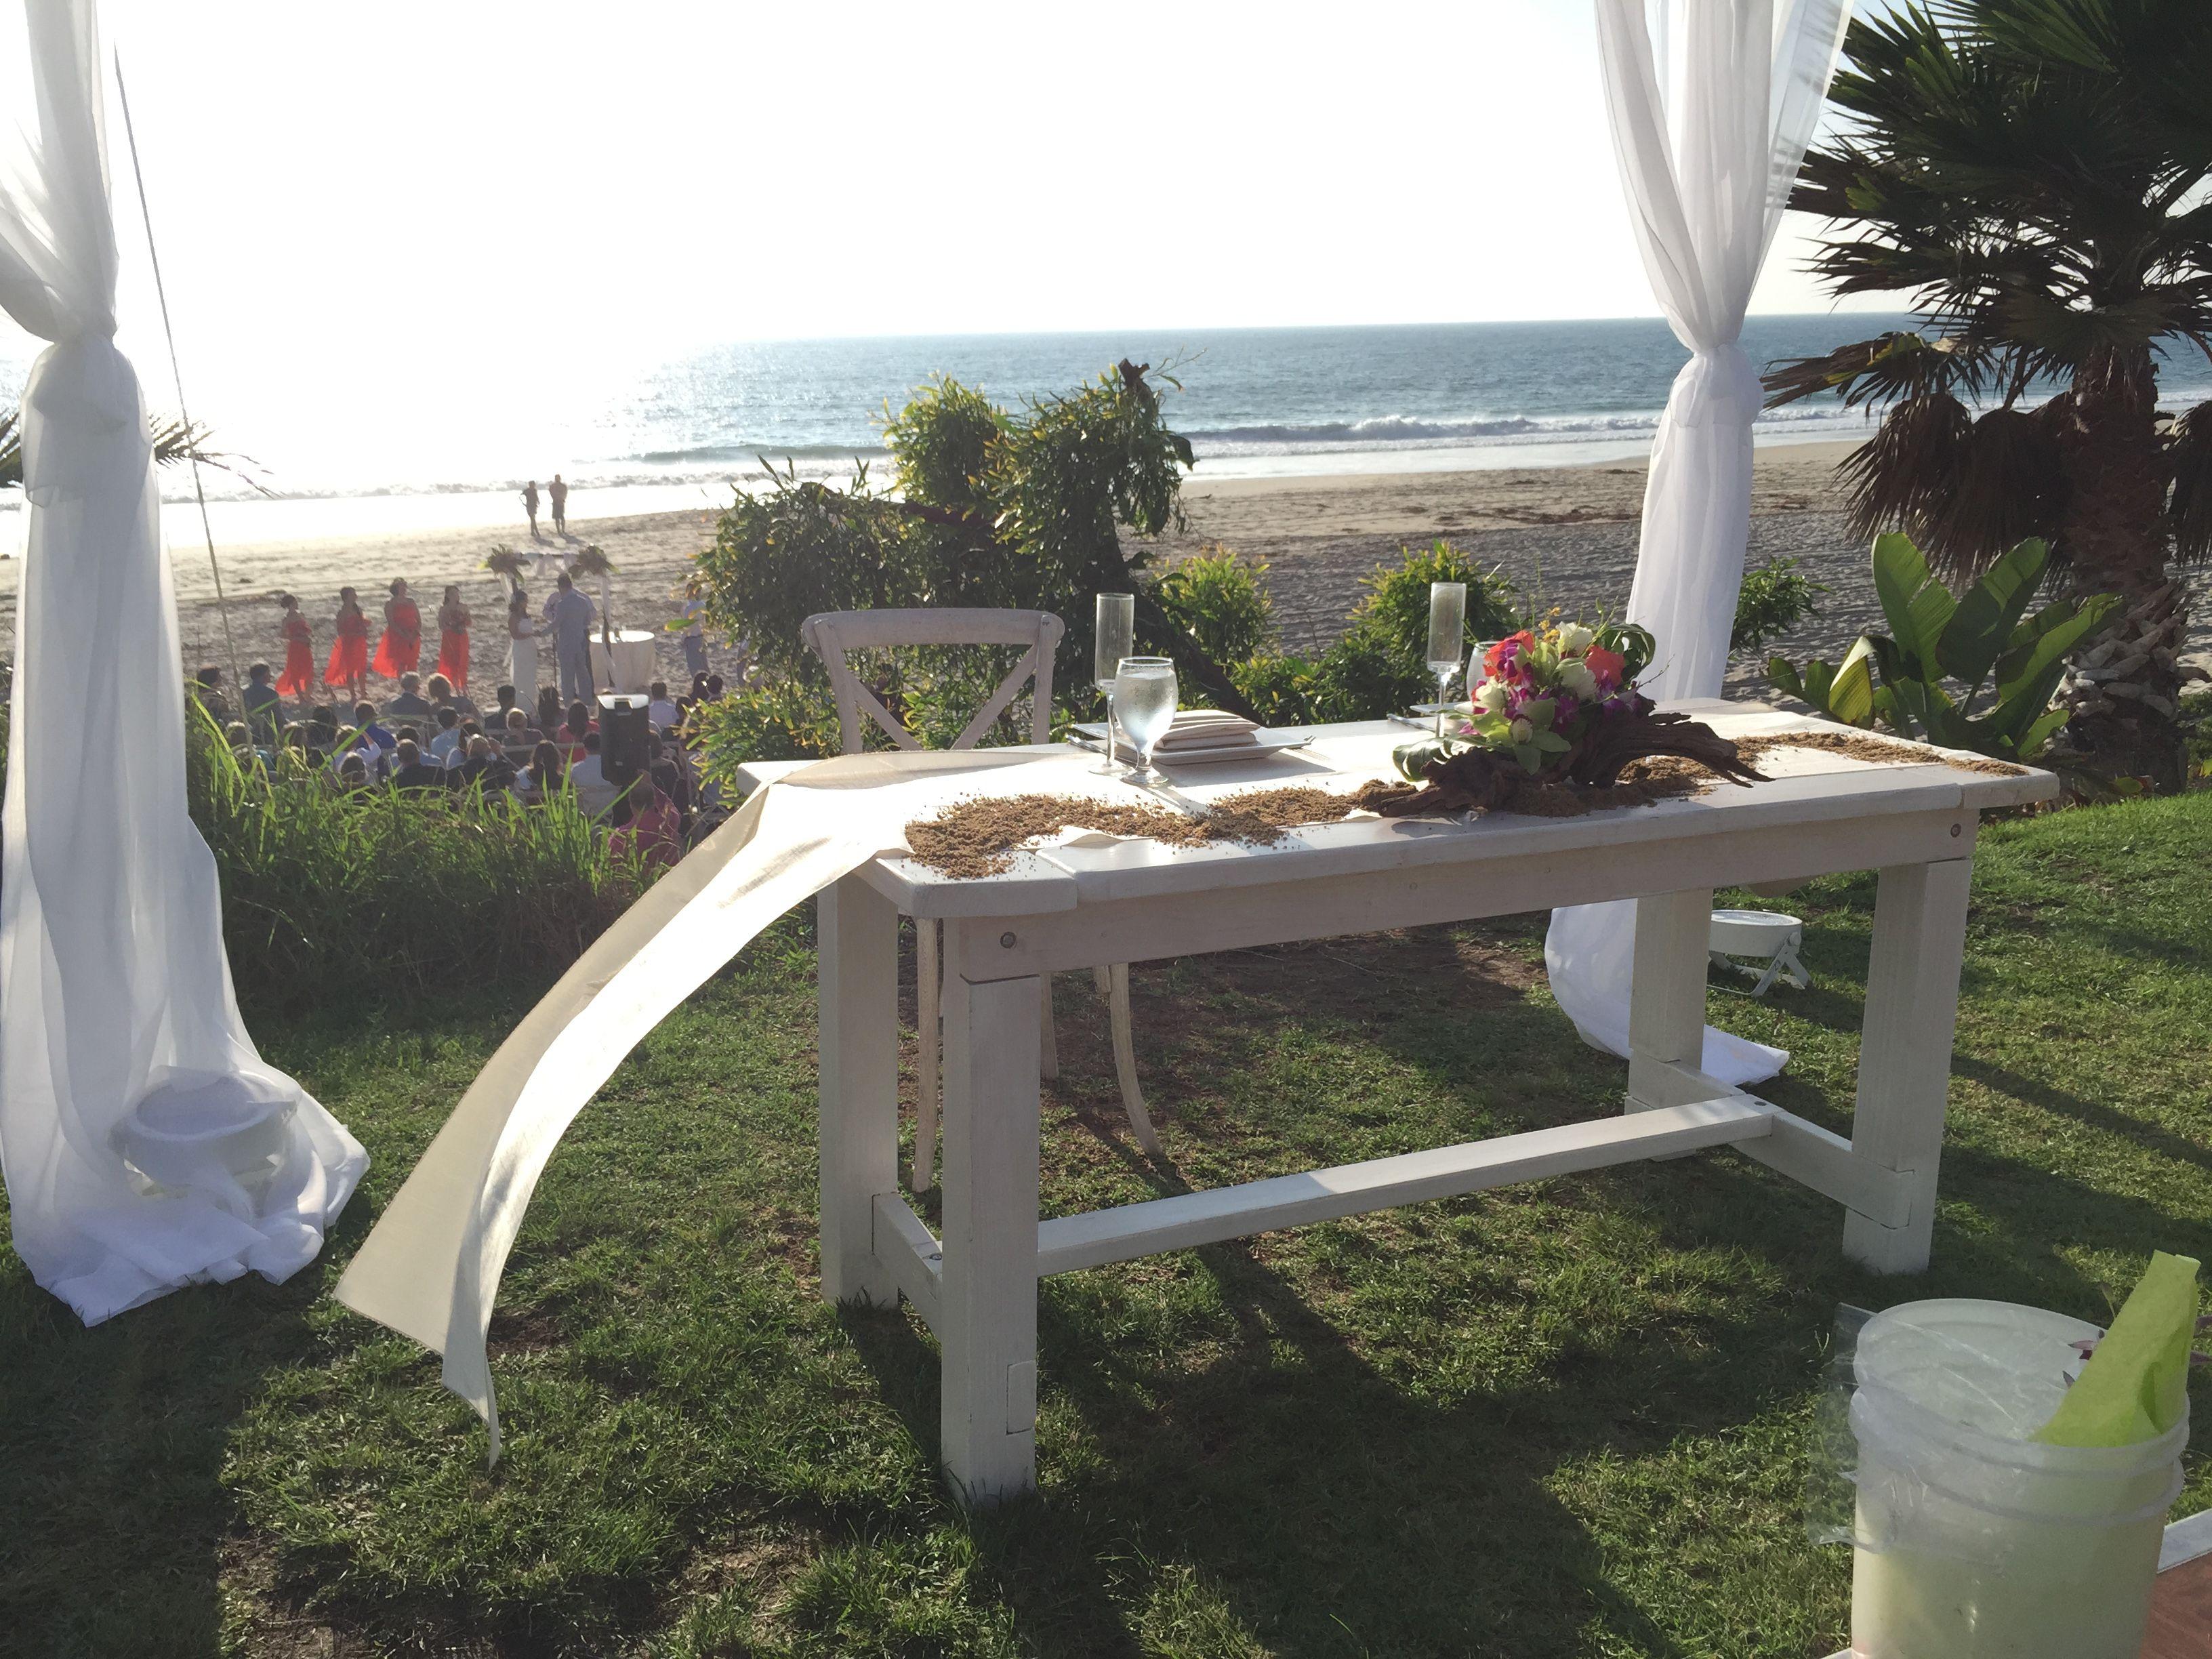 Salt Creek Beach whitewash rustic wedding Sweetheart table